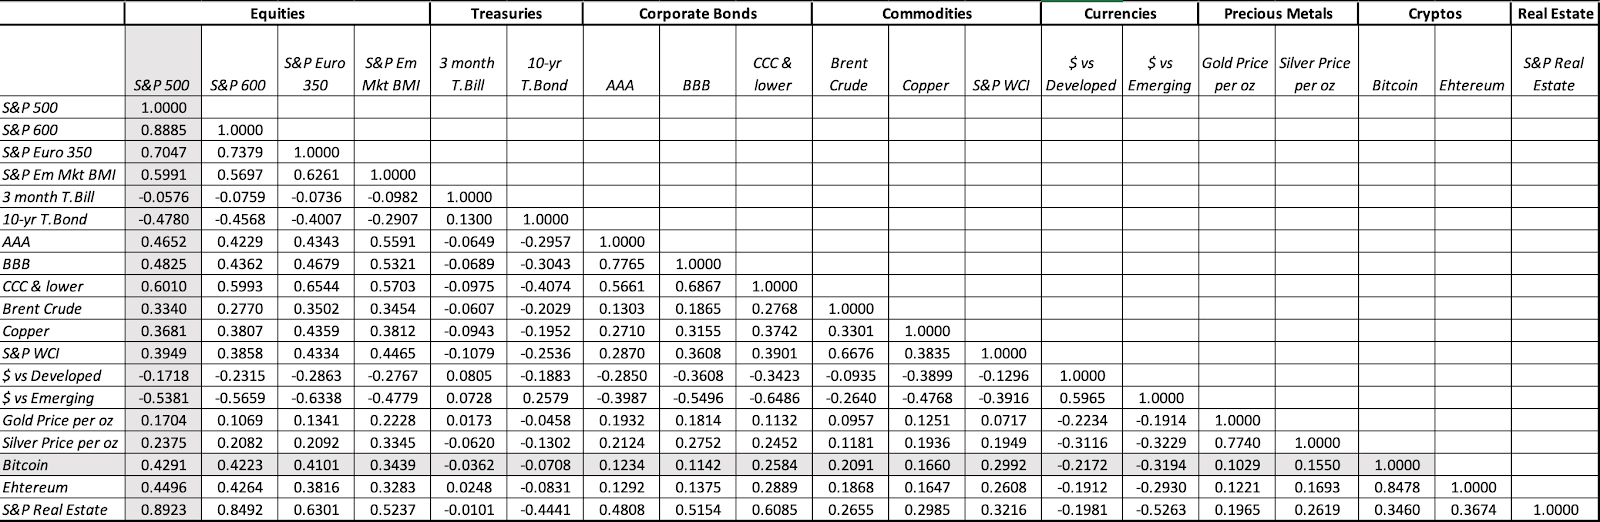 Correlation assets